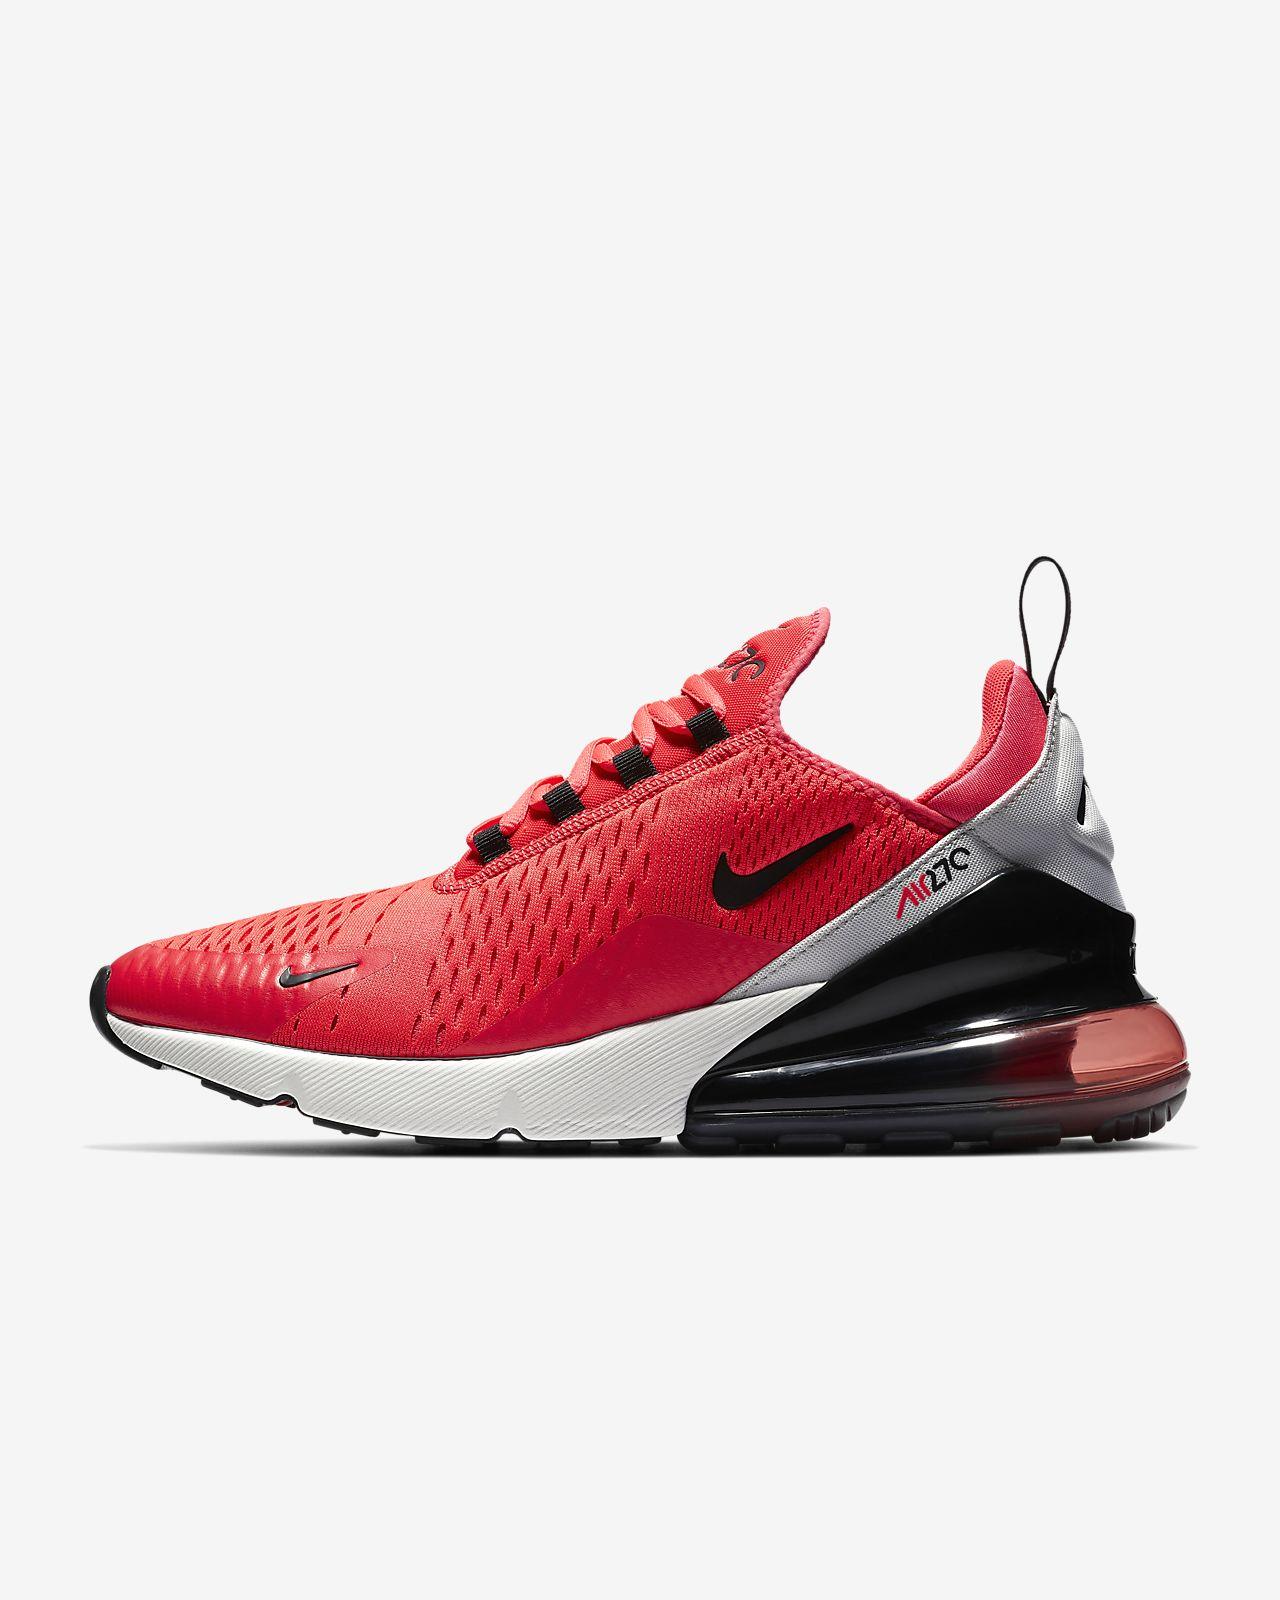 the best attitude 0024d 6074c Nike Air Max 270 Men's Shoe